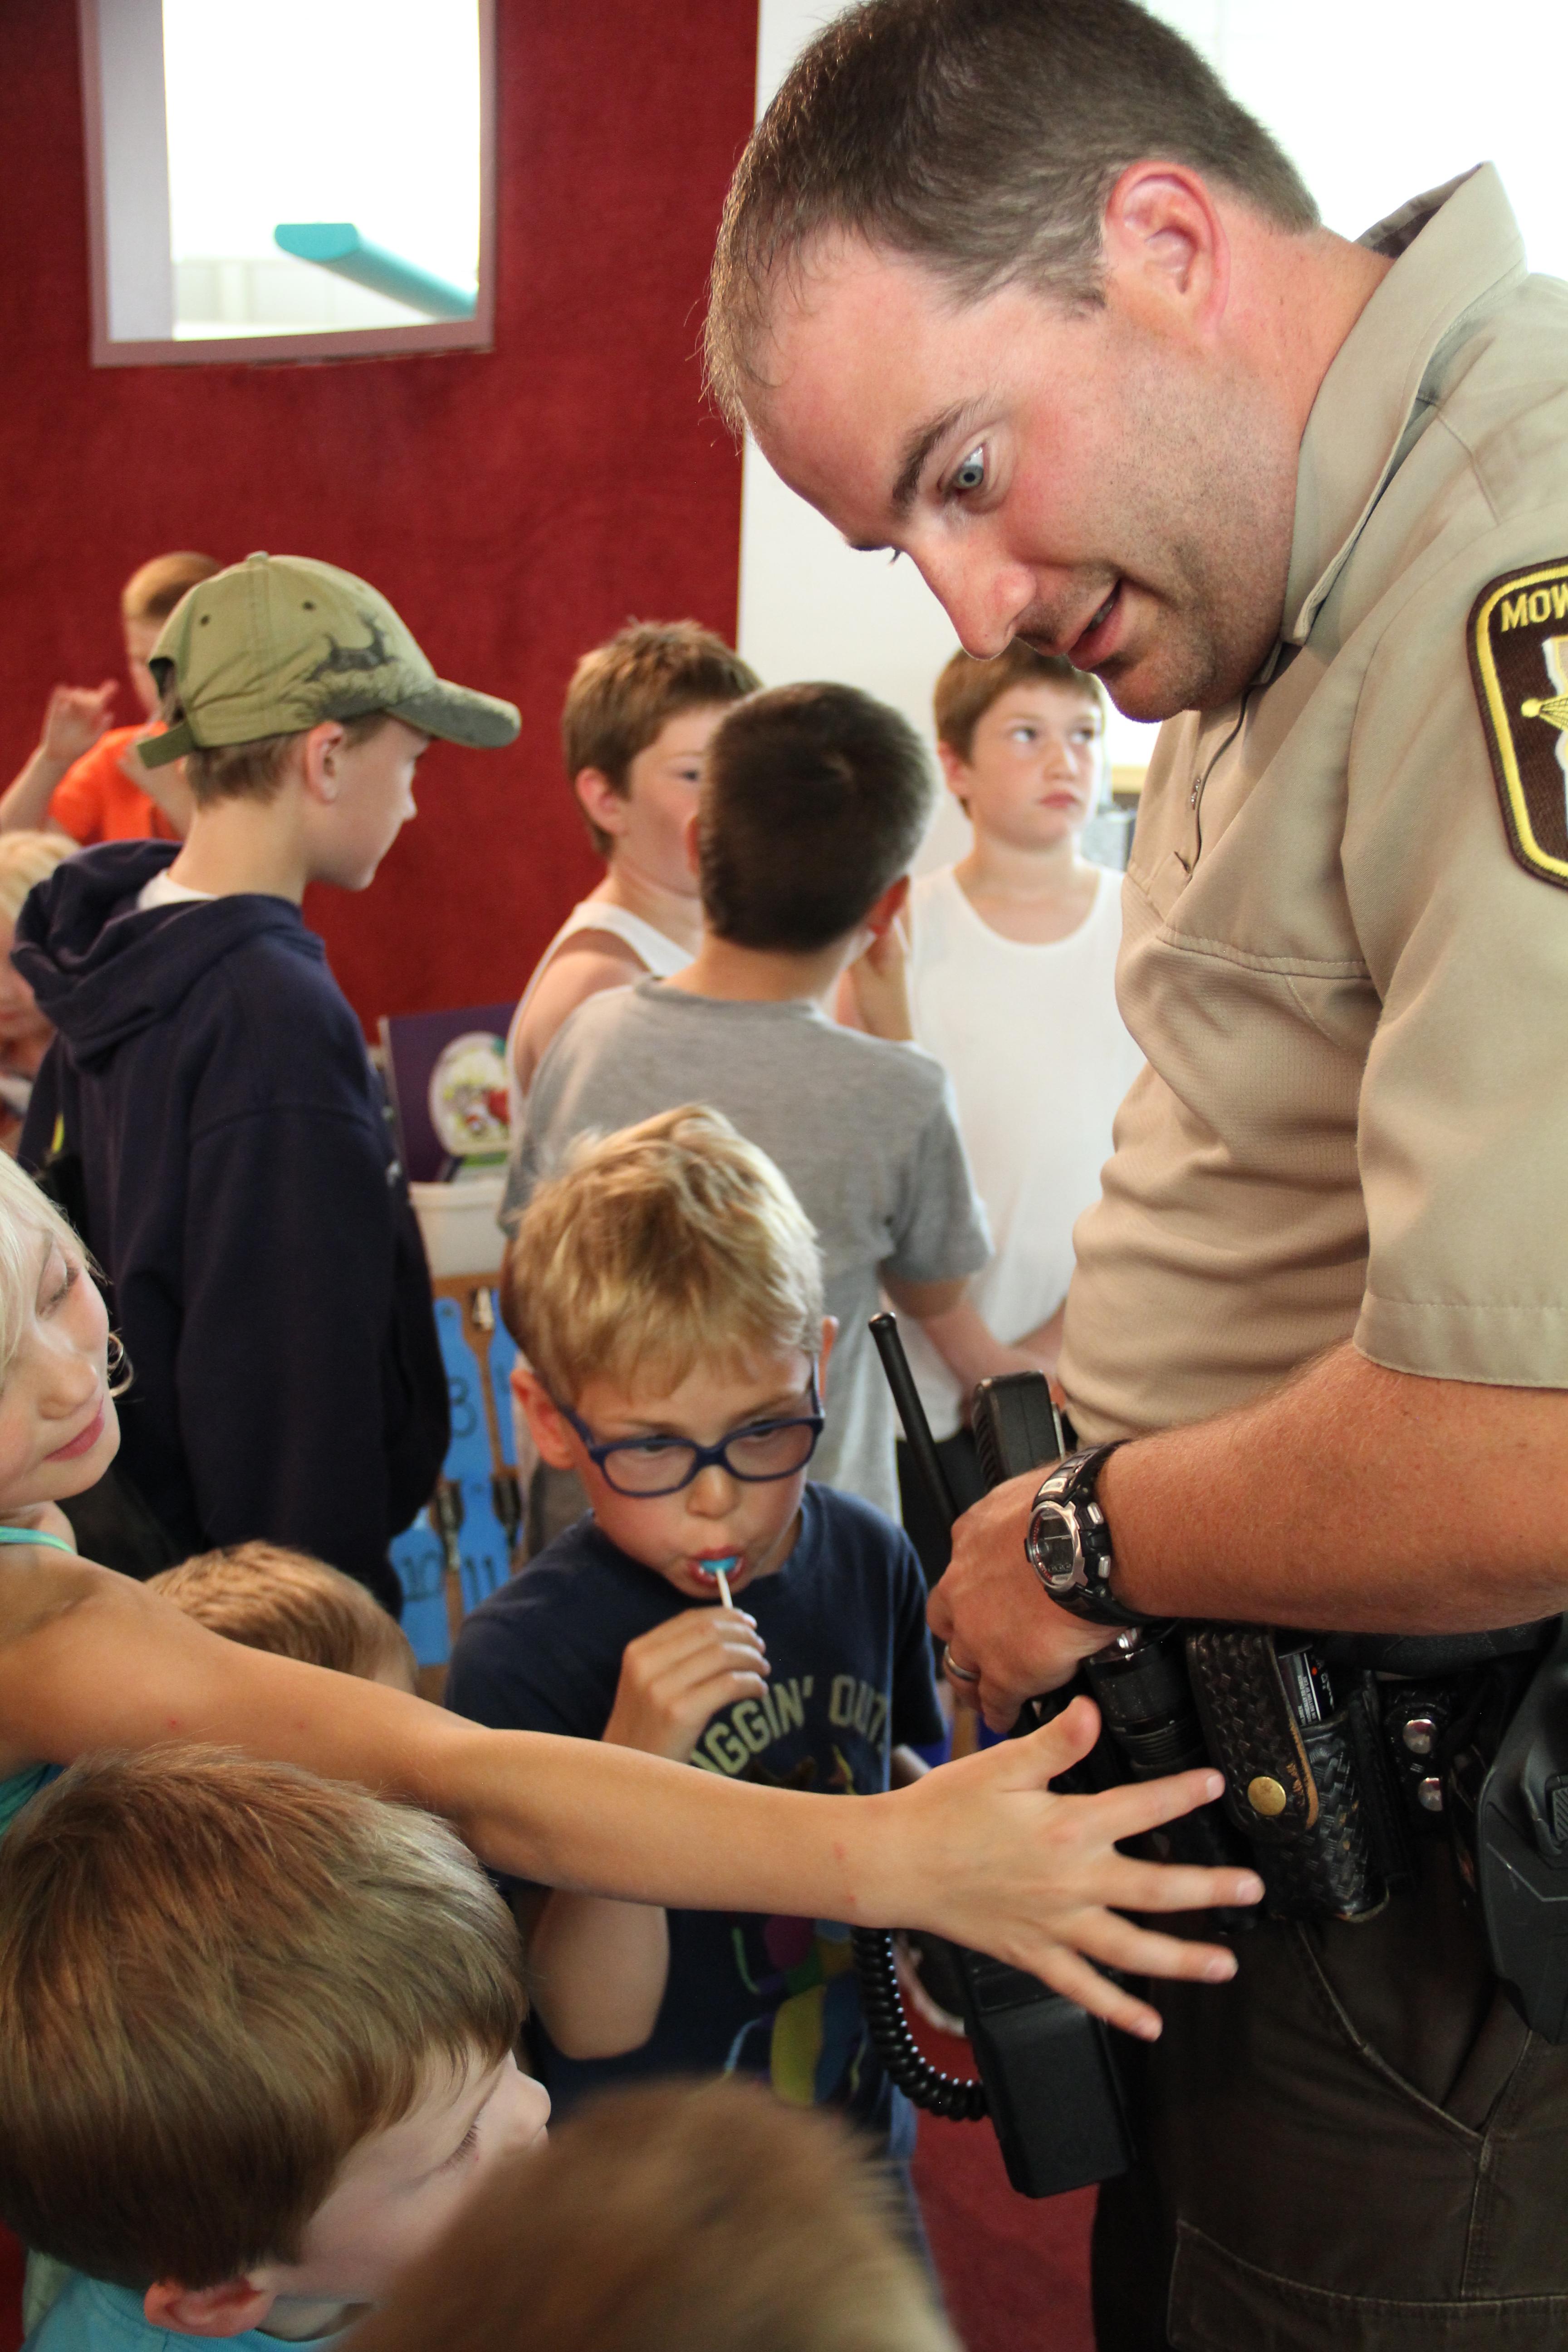 LeRoy Mower County Sheriff's Deputies Jamie Meyer & Ryan Chrz visiting